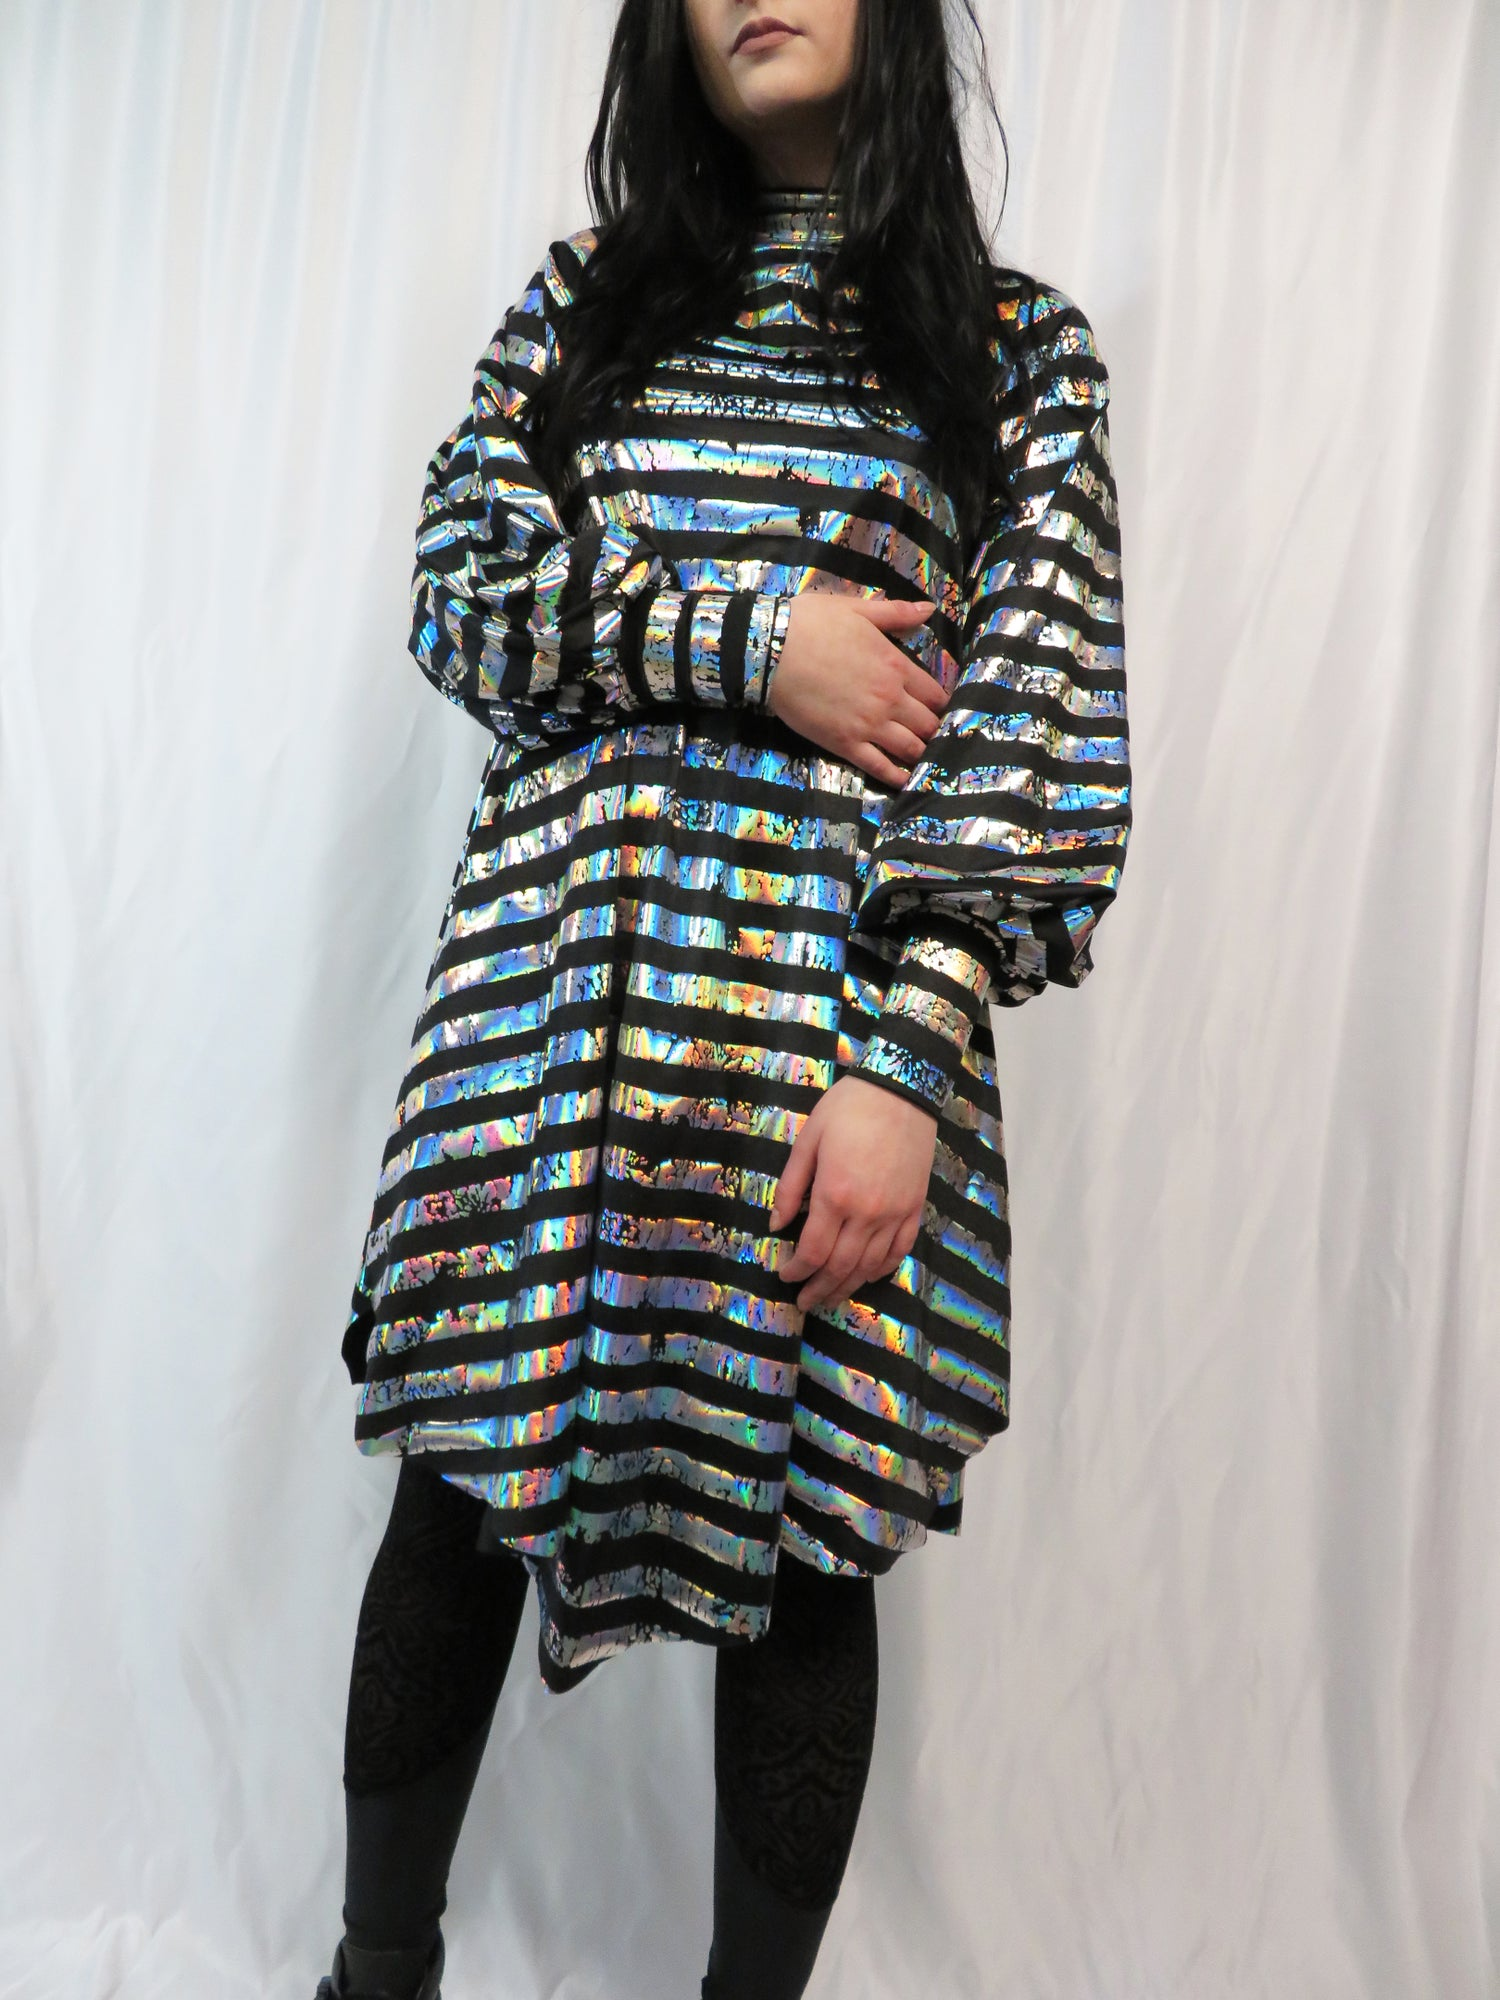 Image of Silver Holographic Stripes on Black Bishop Sleeve Dress